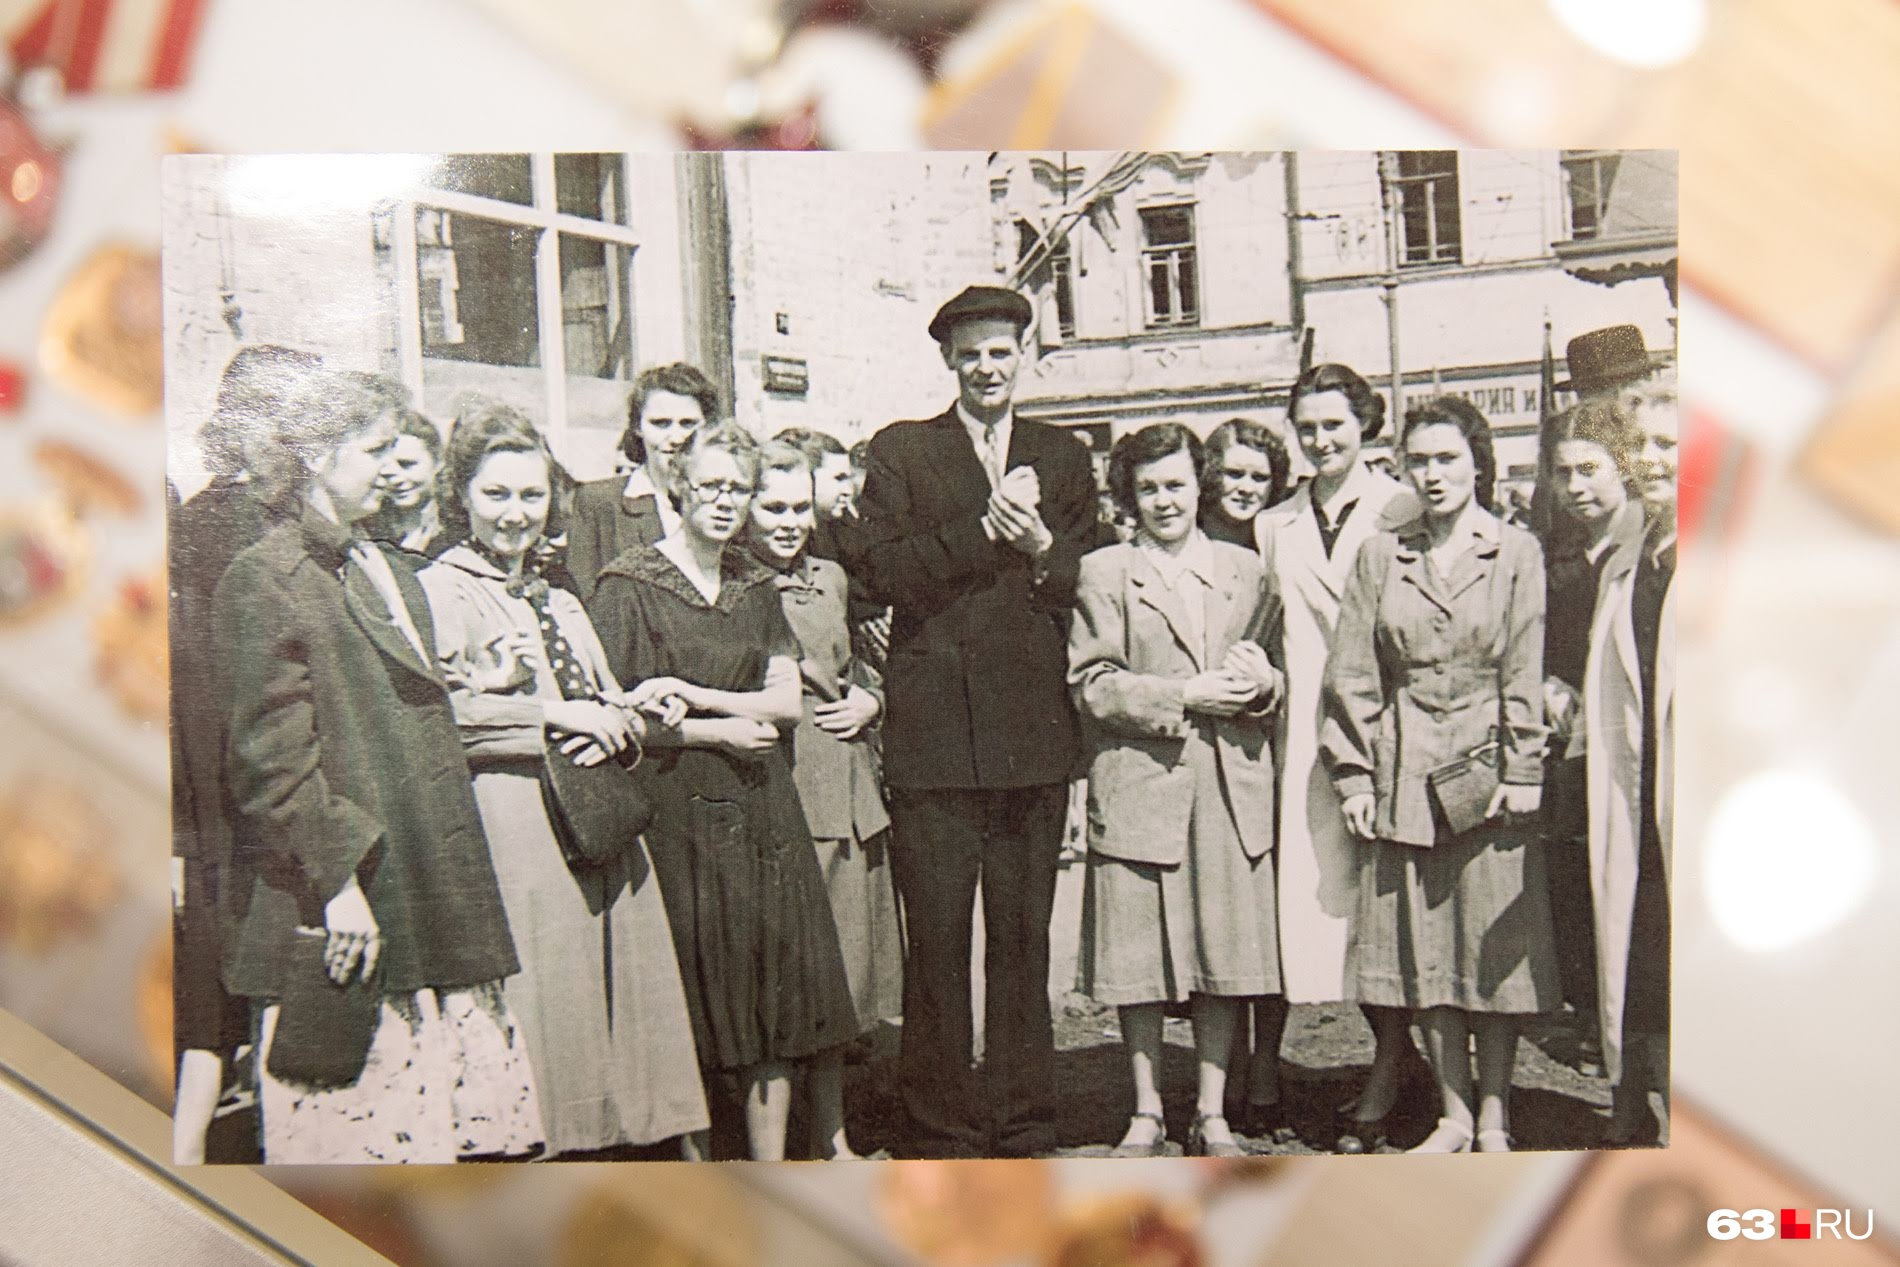 Студентки пединститута и тот, кого они знали под именем Марк Фрейзер. Роза Байлук на фотографии слева от него